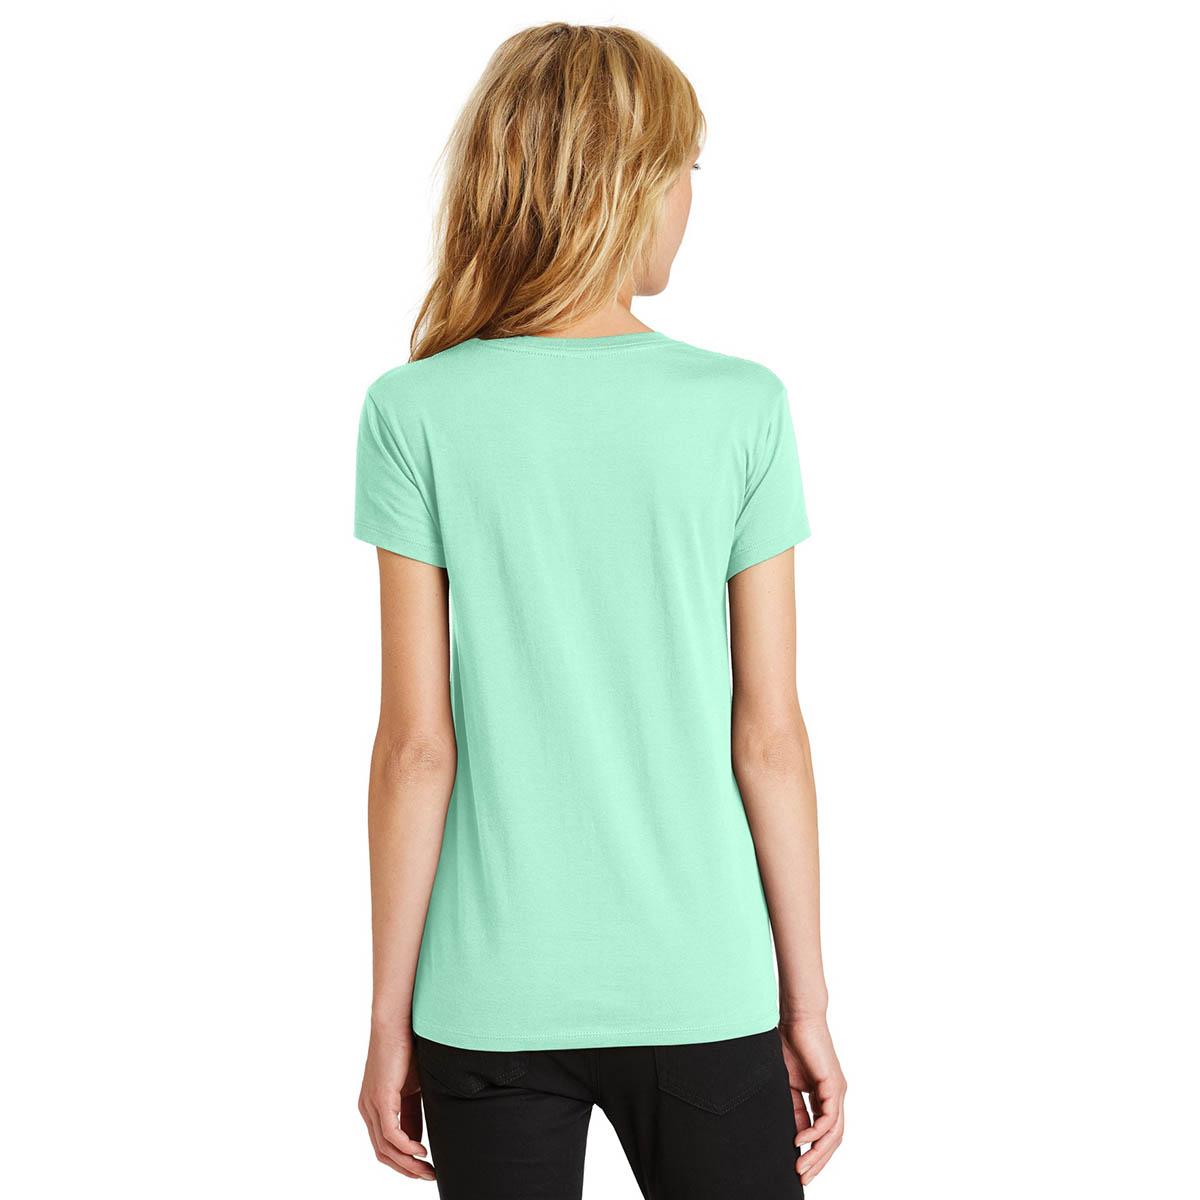 Alternative aa9072 legacy crew t shirt mint for Mint color t shirt